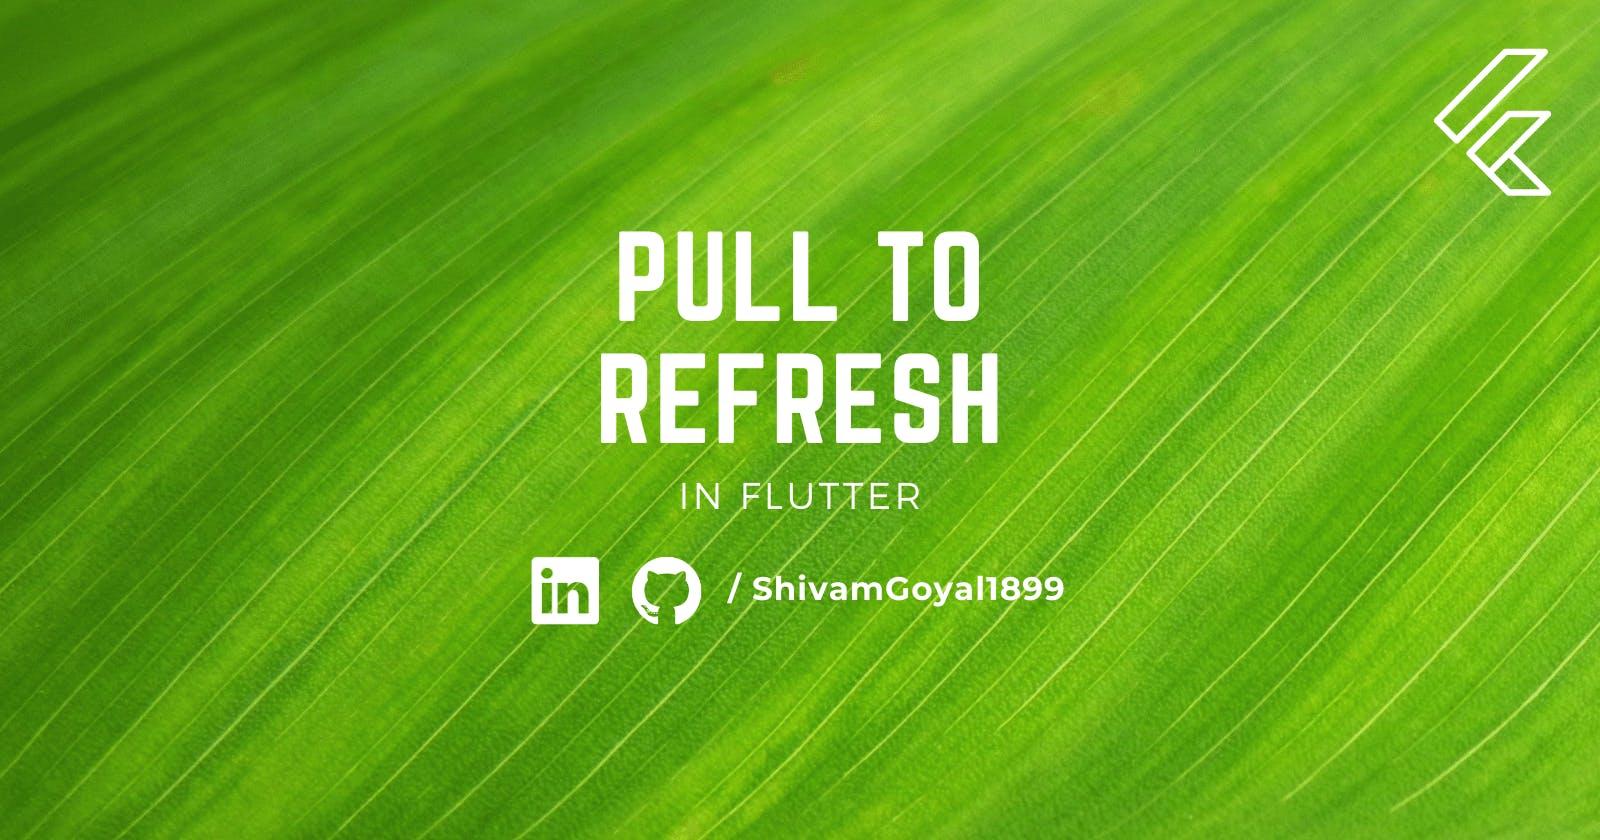 Building Flutter PullToRefresh in just 15 minutes